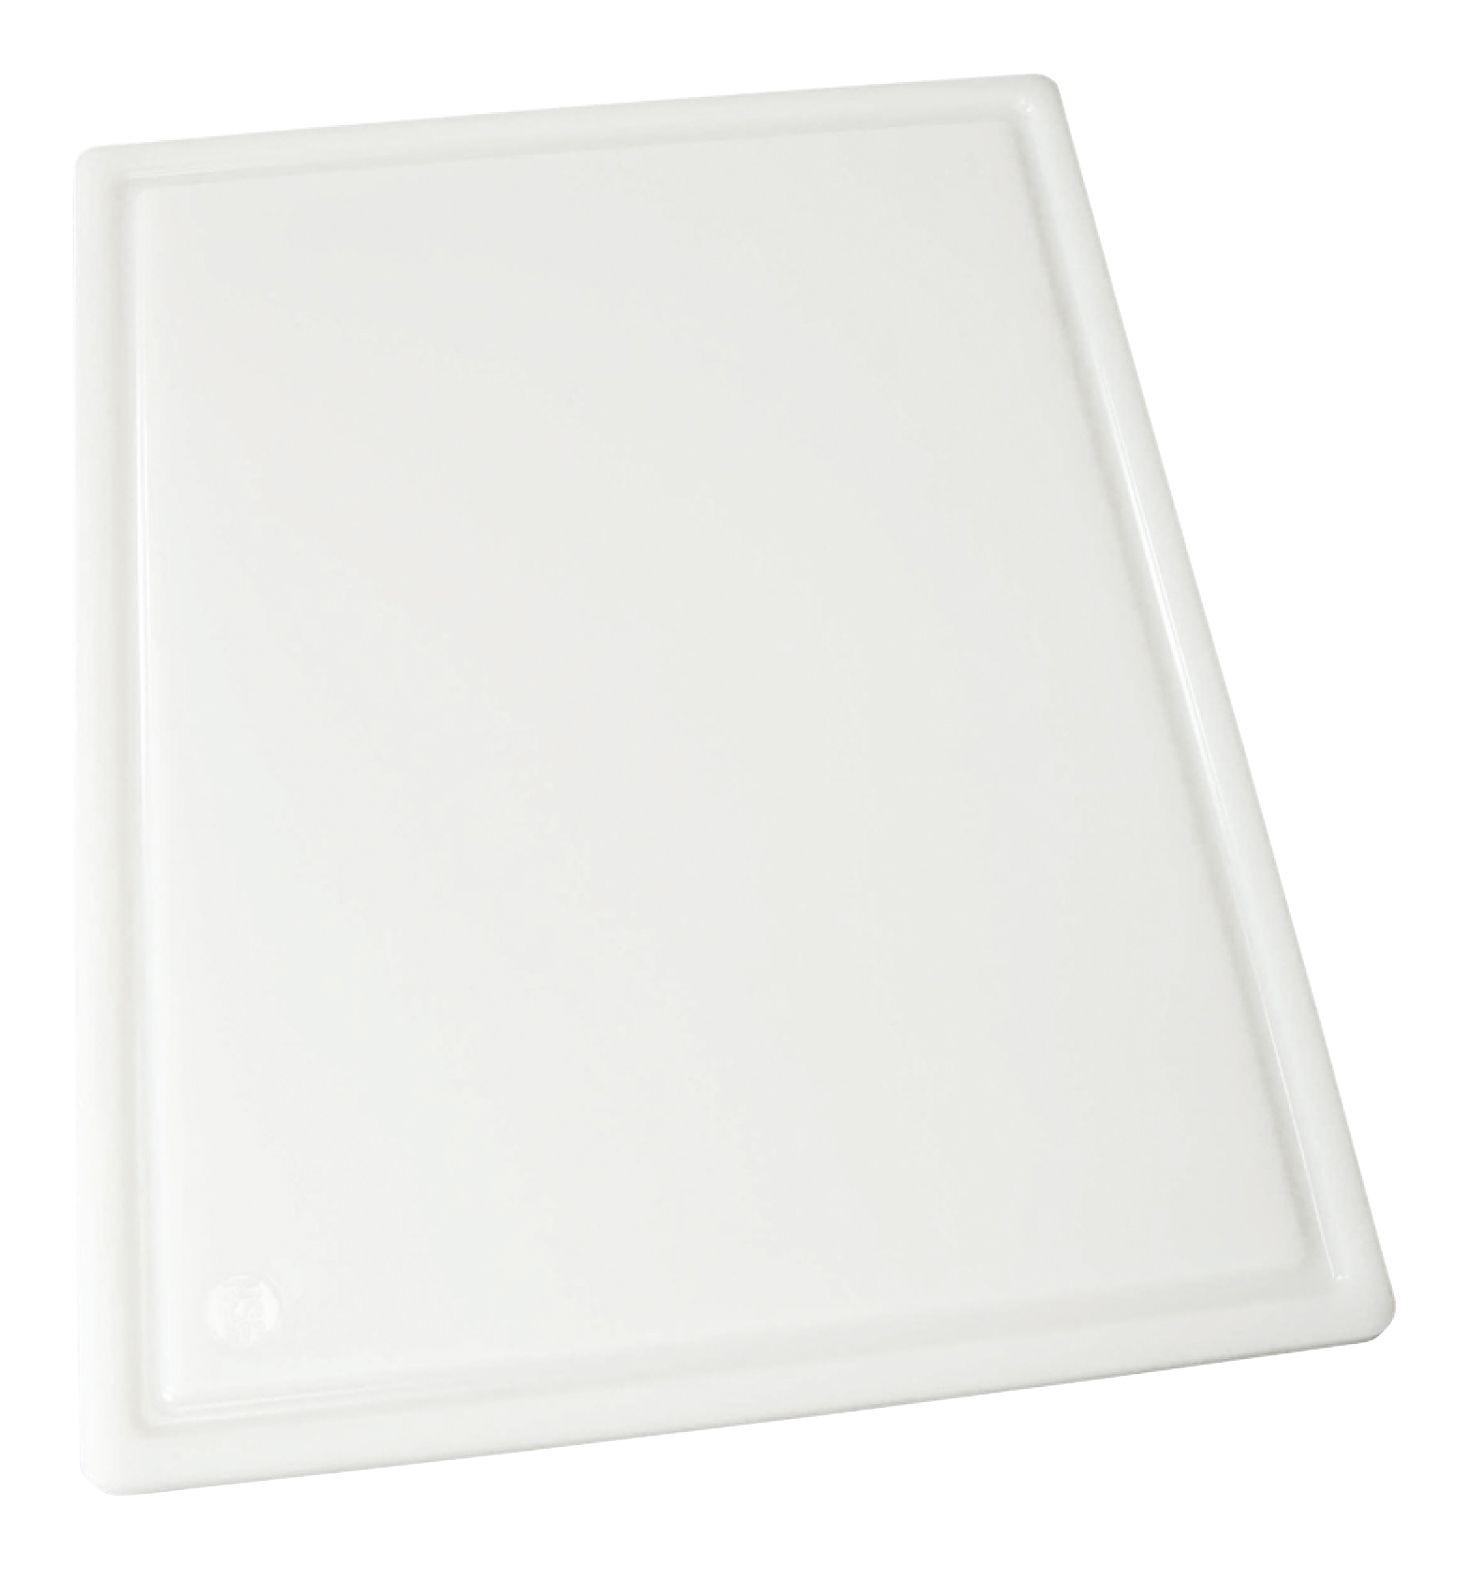 "Winco CBI-1824 Grooved White Cutting Board 18"" x 24"" x 1/2"""